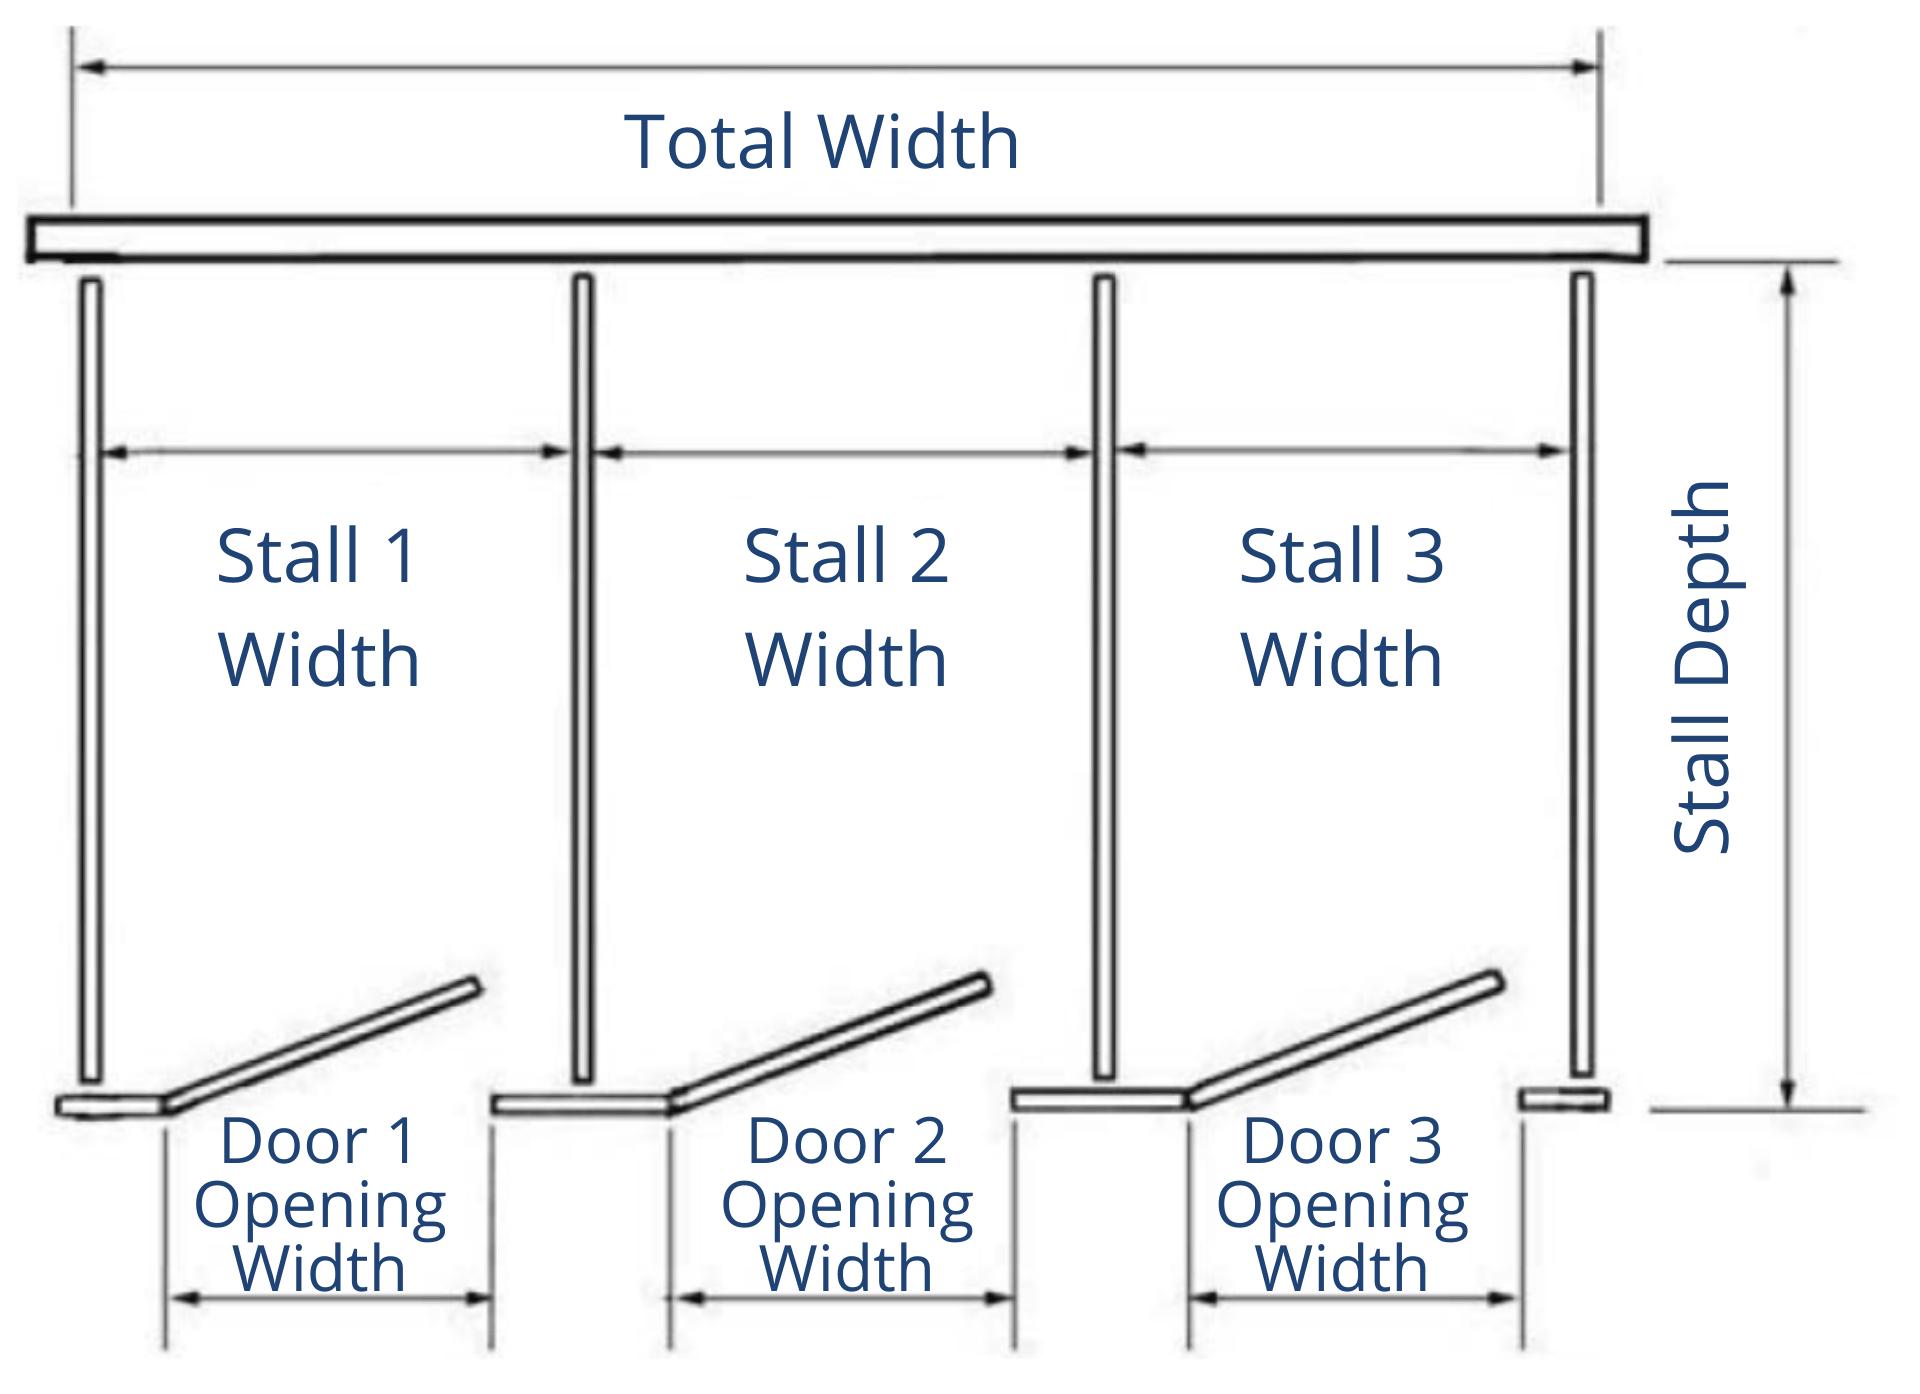 3 Stalls Free Standing Diagram